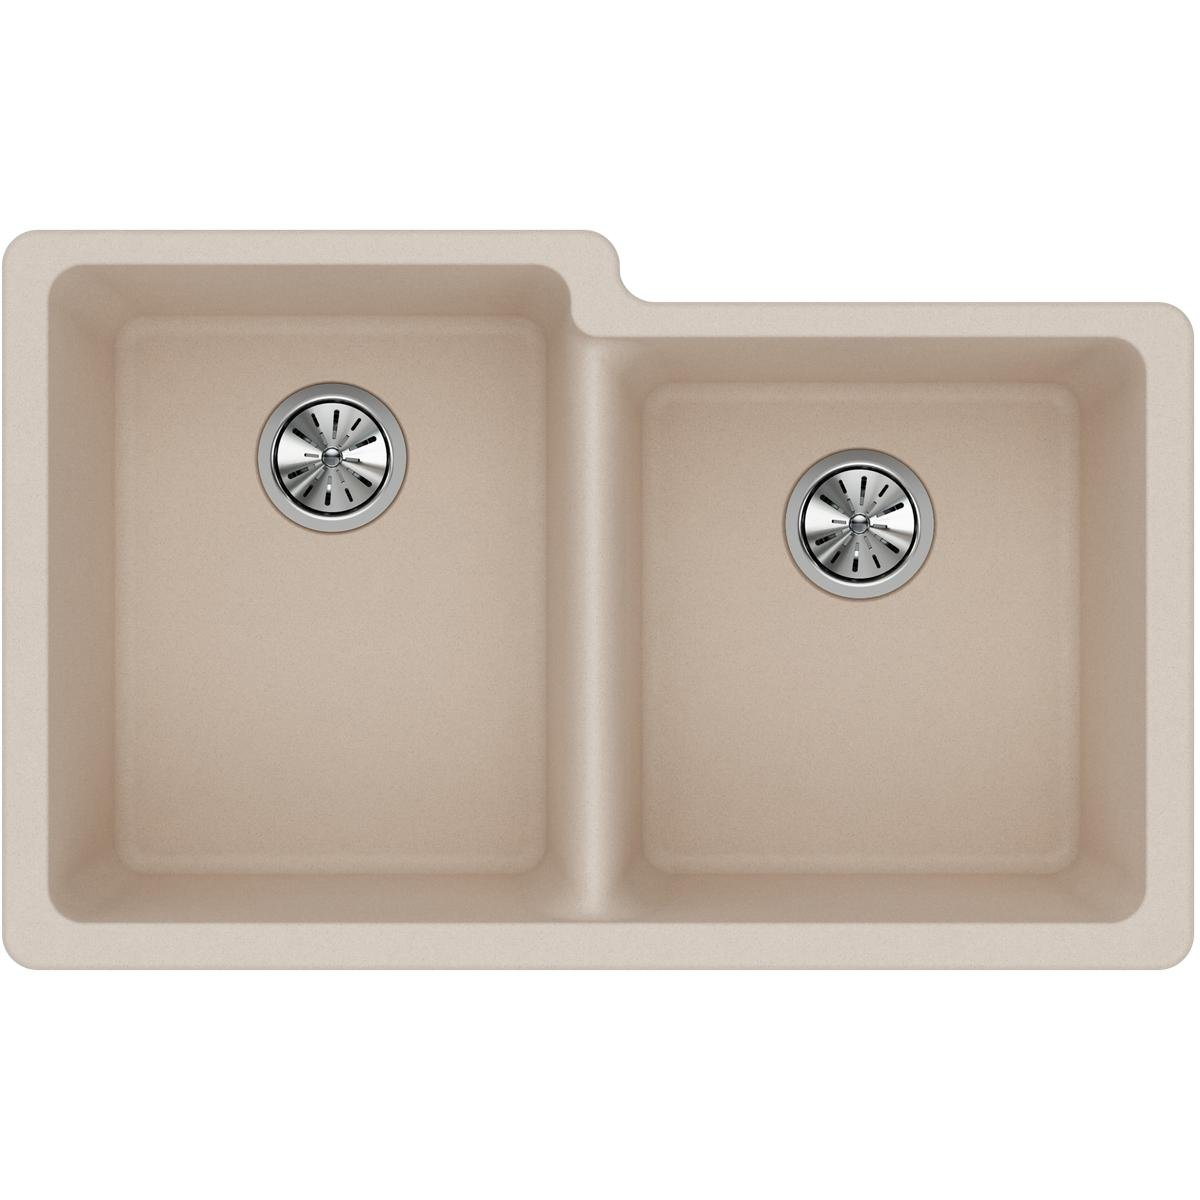 Elkay Quartz Classic ELGU250RPT0 Putty Offset Double Bowl Undermount Sink